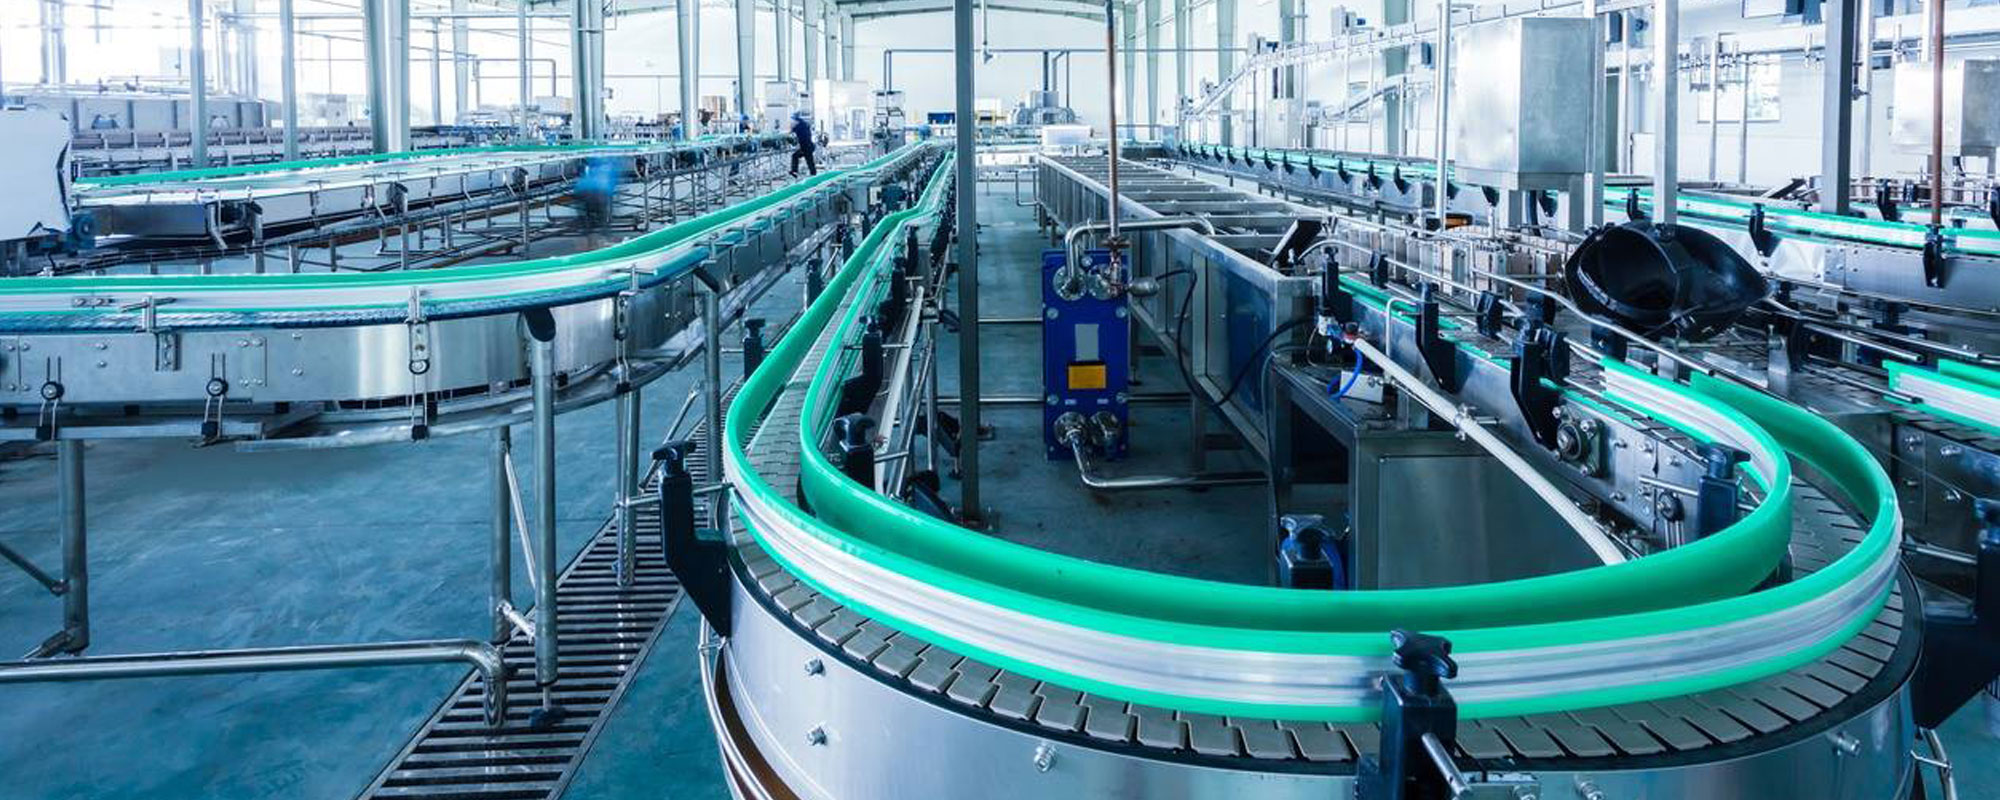 Plastic Ingenuity Chooses Tooele City